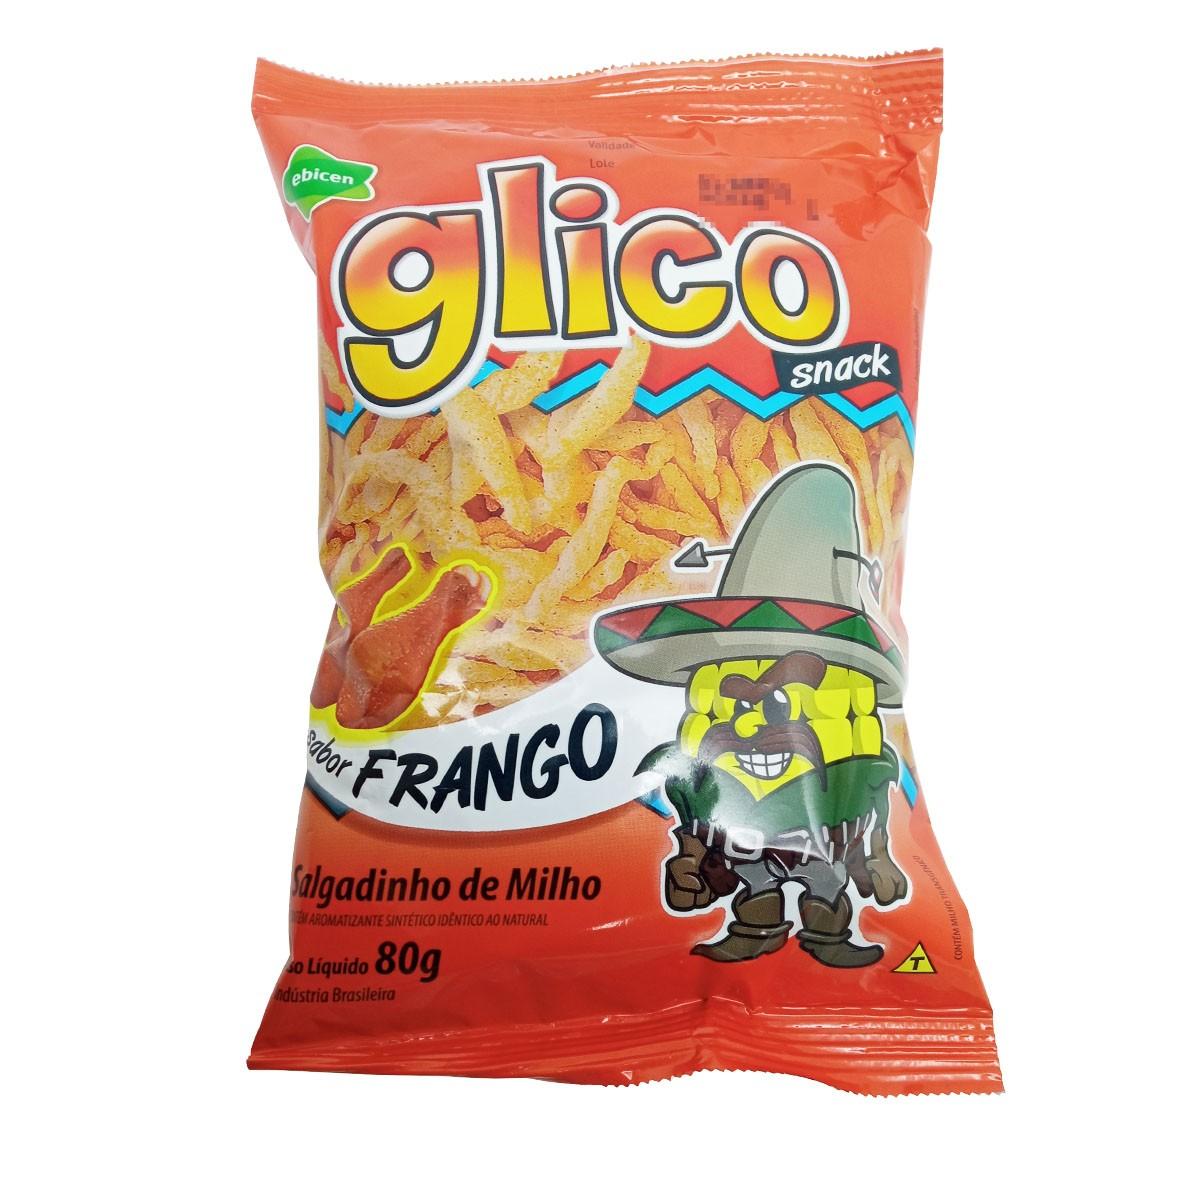 Salgadinho Glico Snack sabor Frango 40g - Ebicen